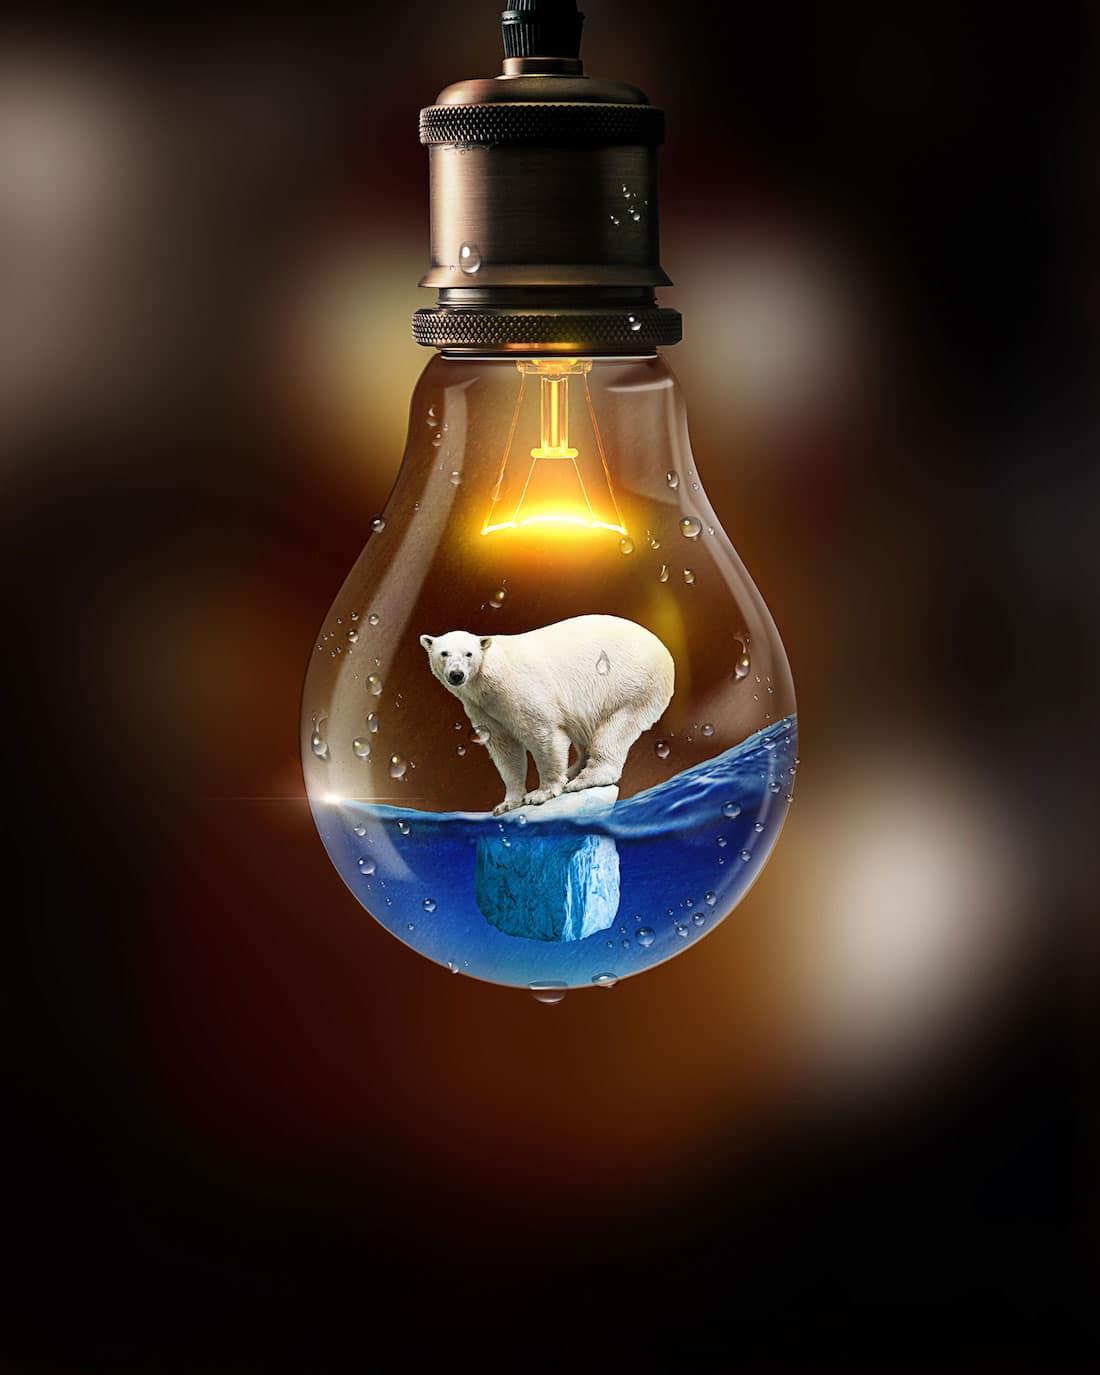 Andreas Haggkvist Surreal Animal Art